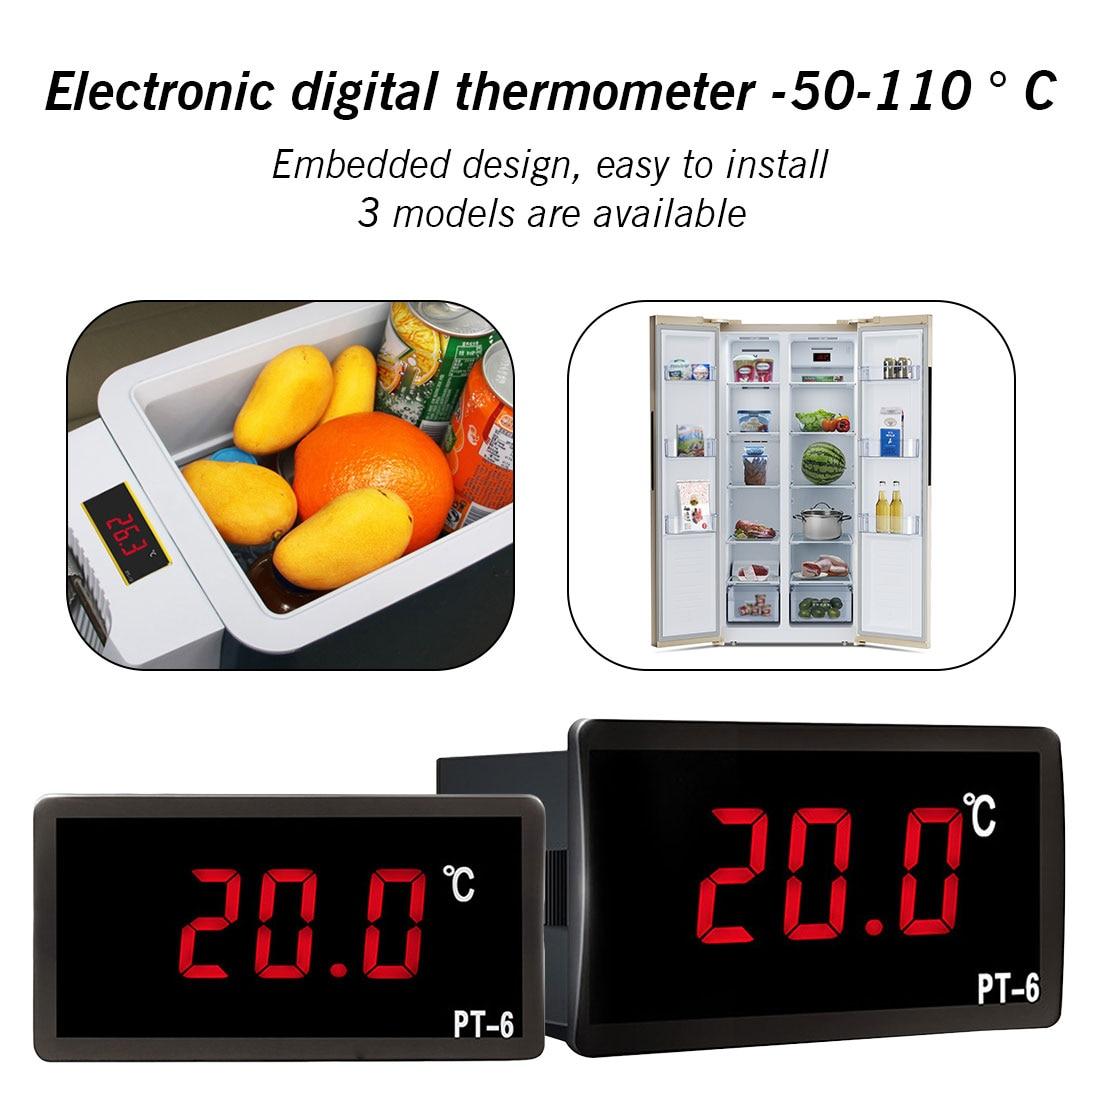 Monitor 12V 24V 110V Automotive Thermometer PT-6 -50-110℃ Digital Car Vehicle Temperature Meter